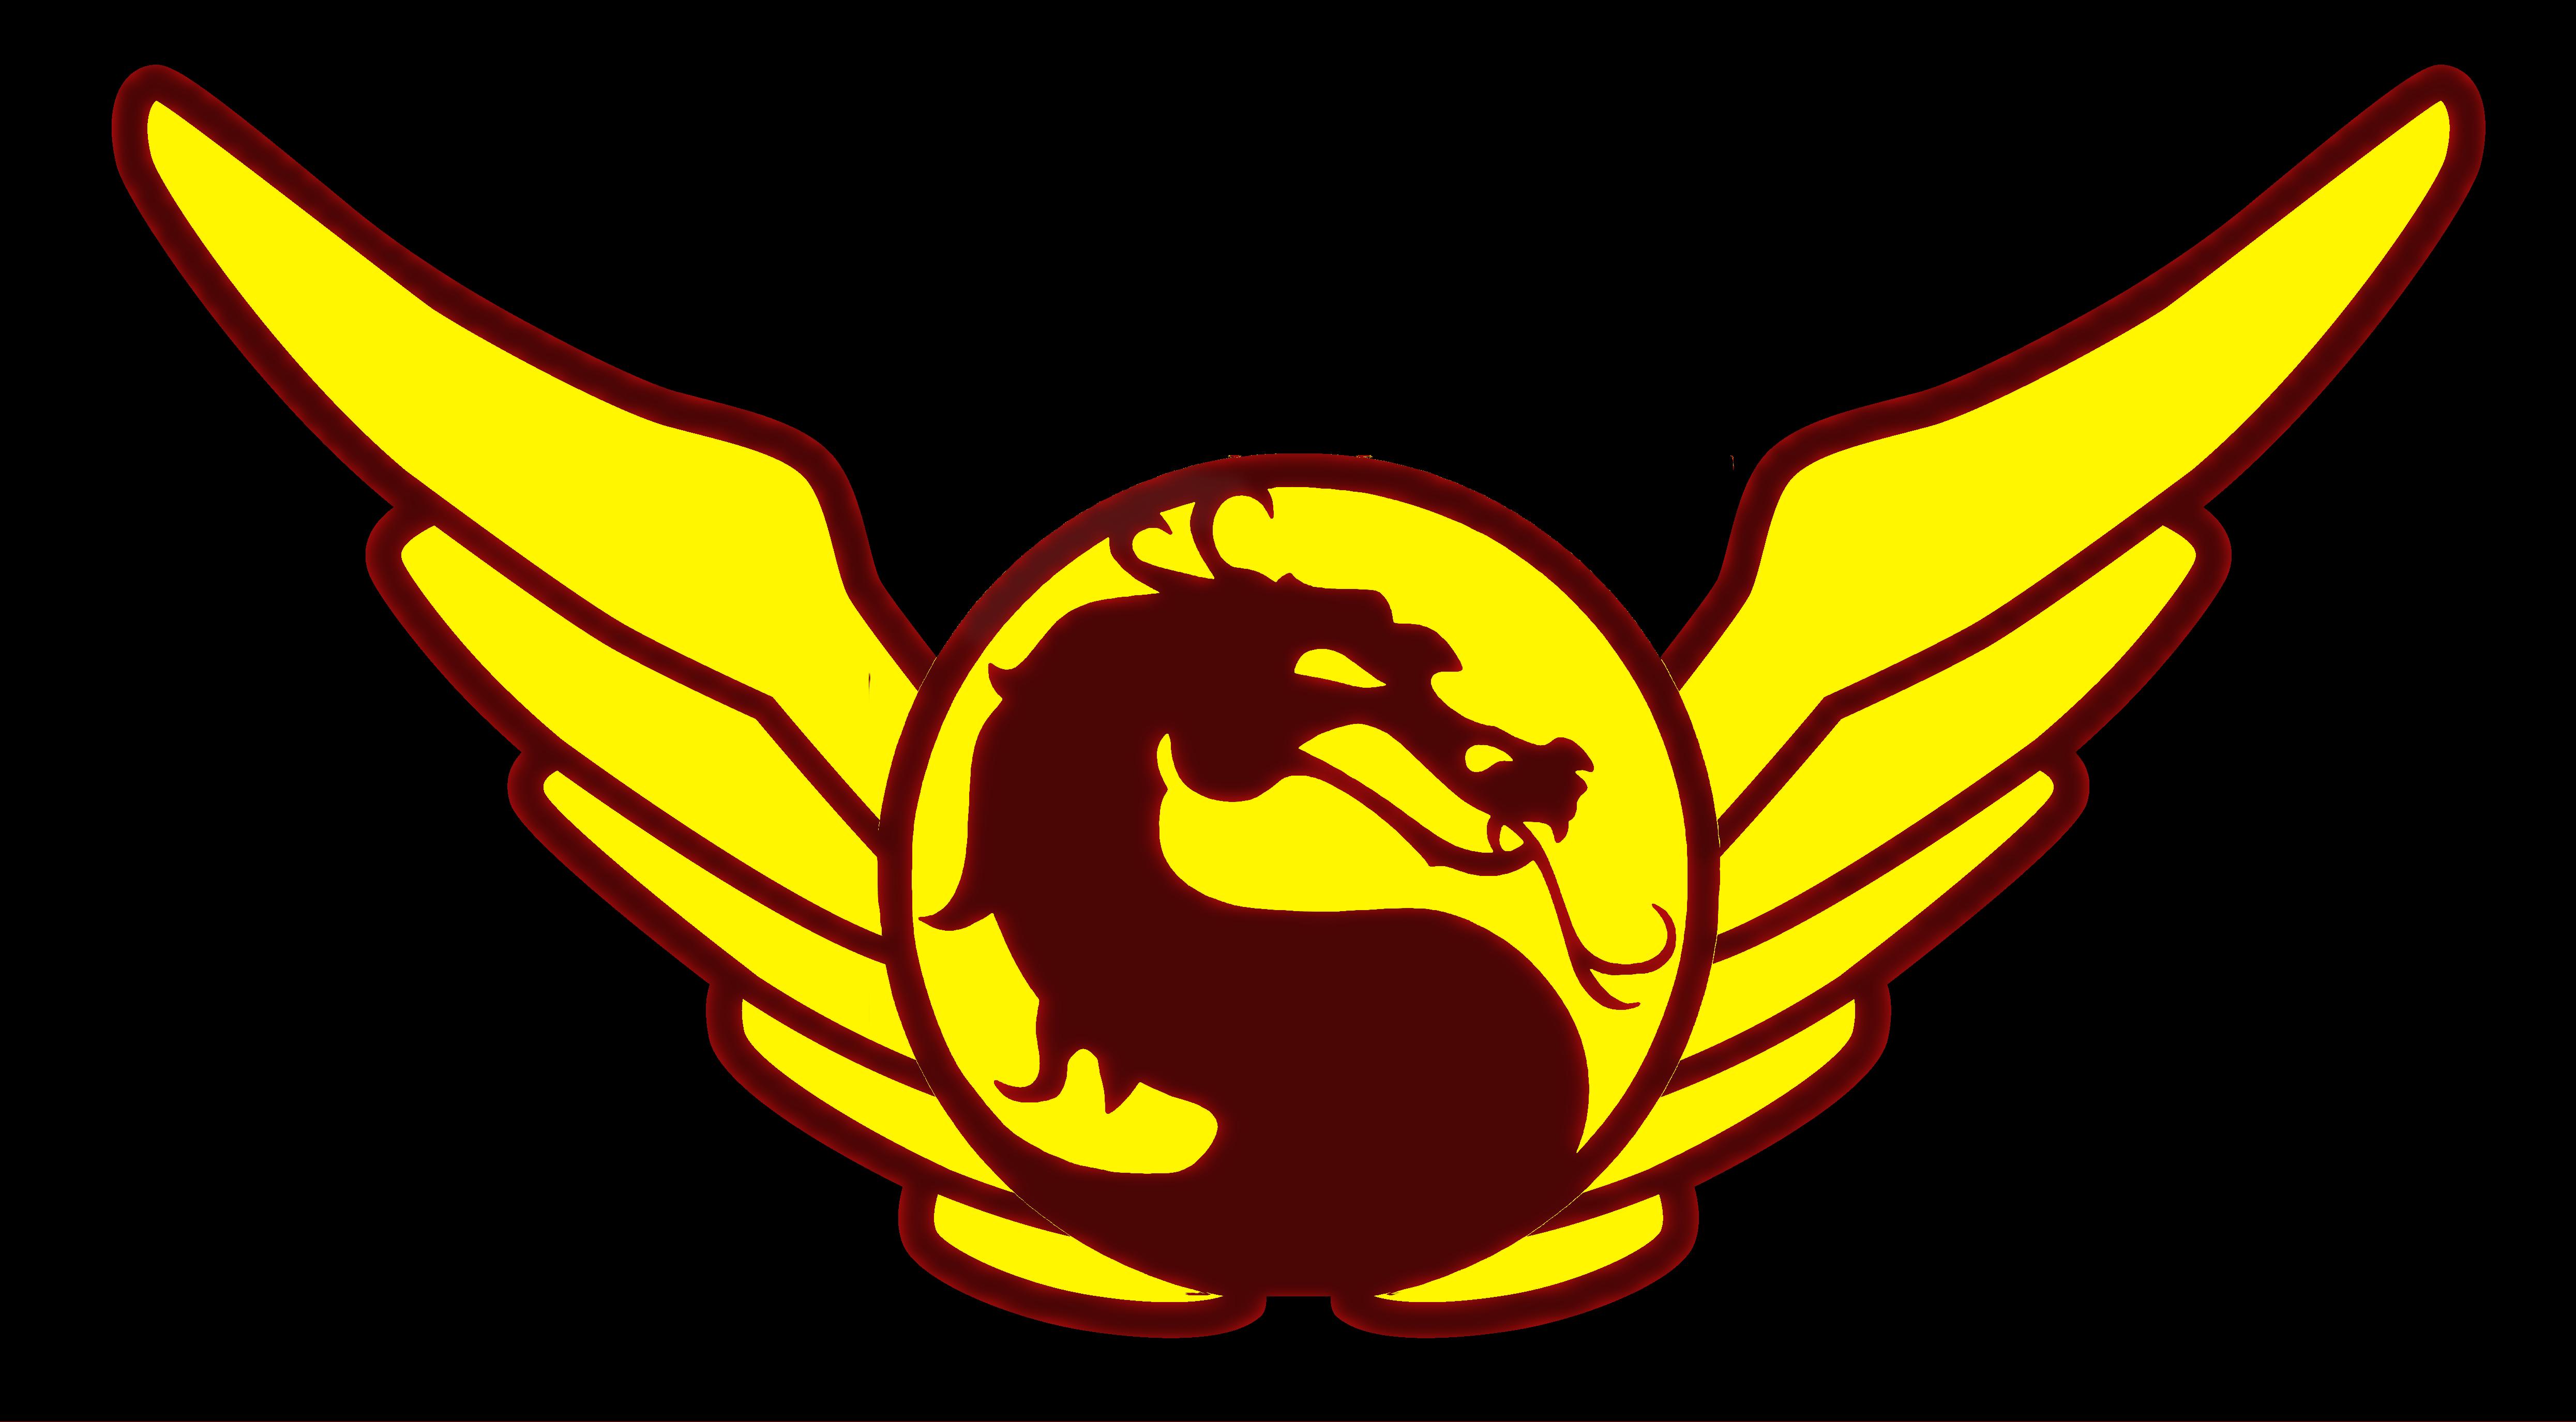 Super Mortal Kombat Vs Street Fighter By Drawnder